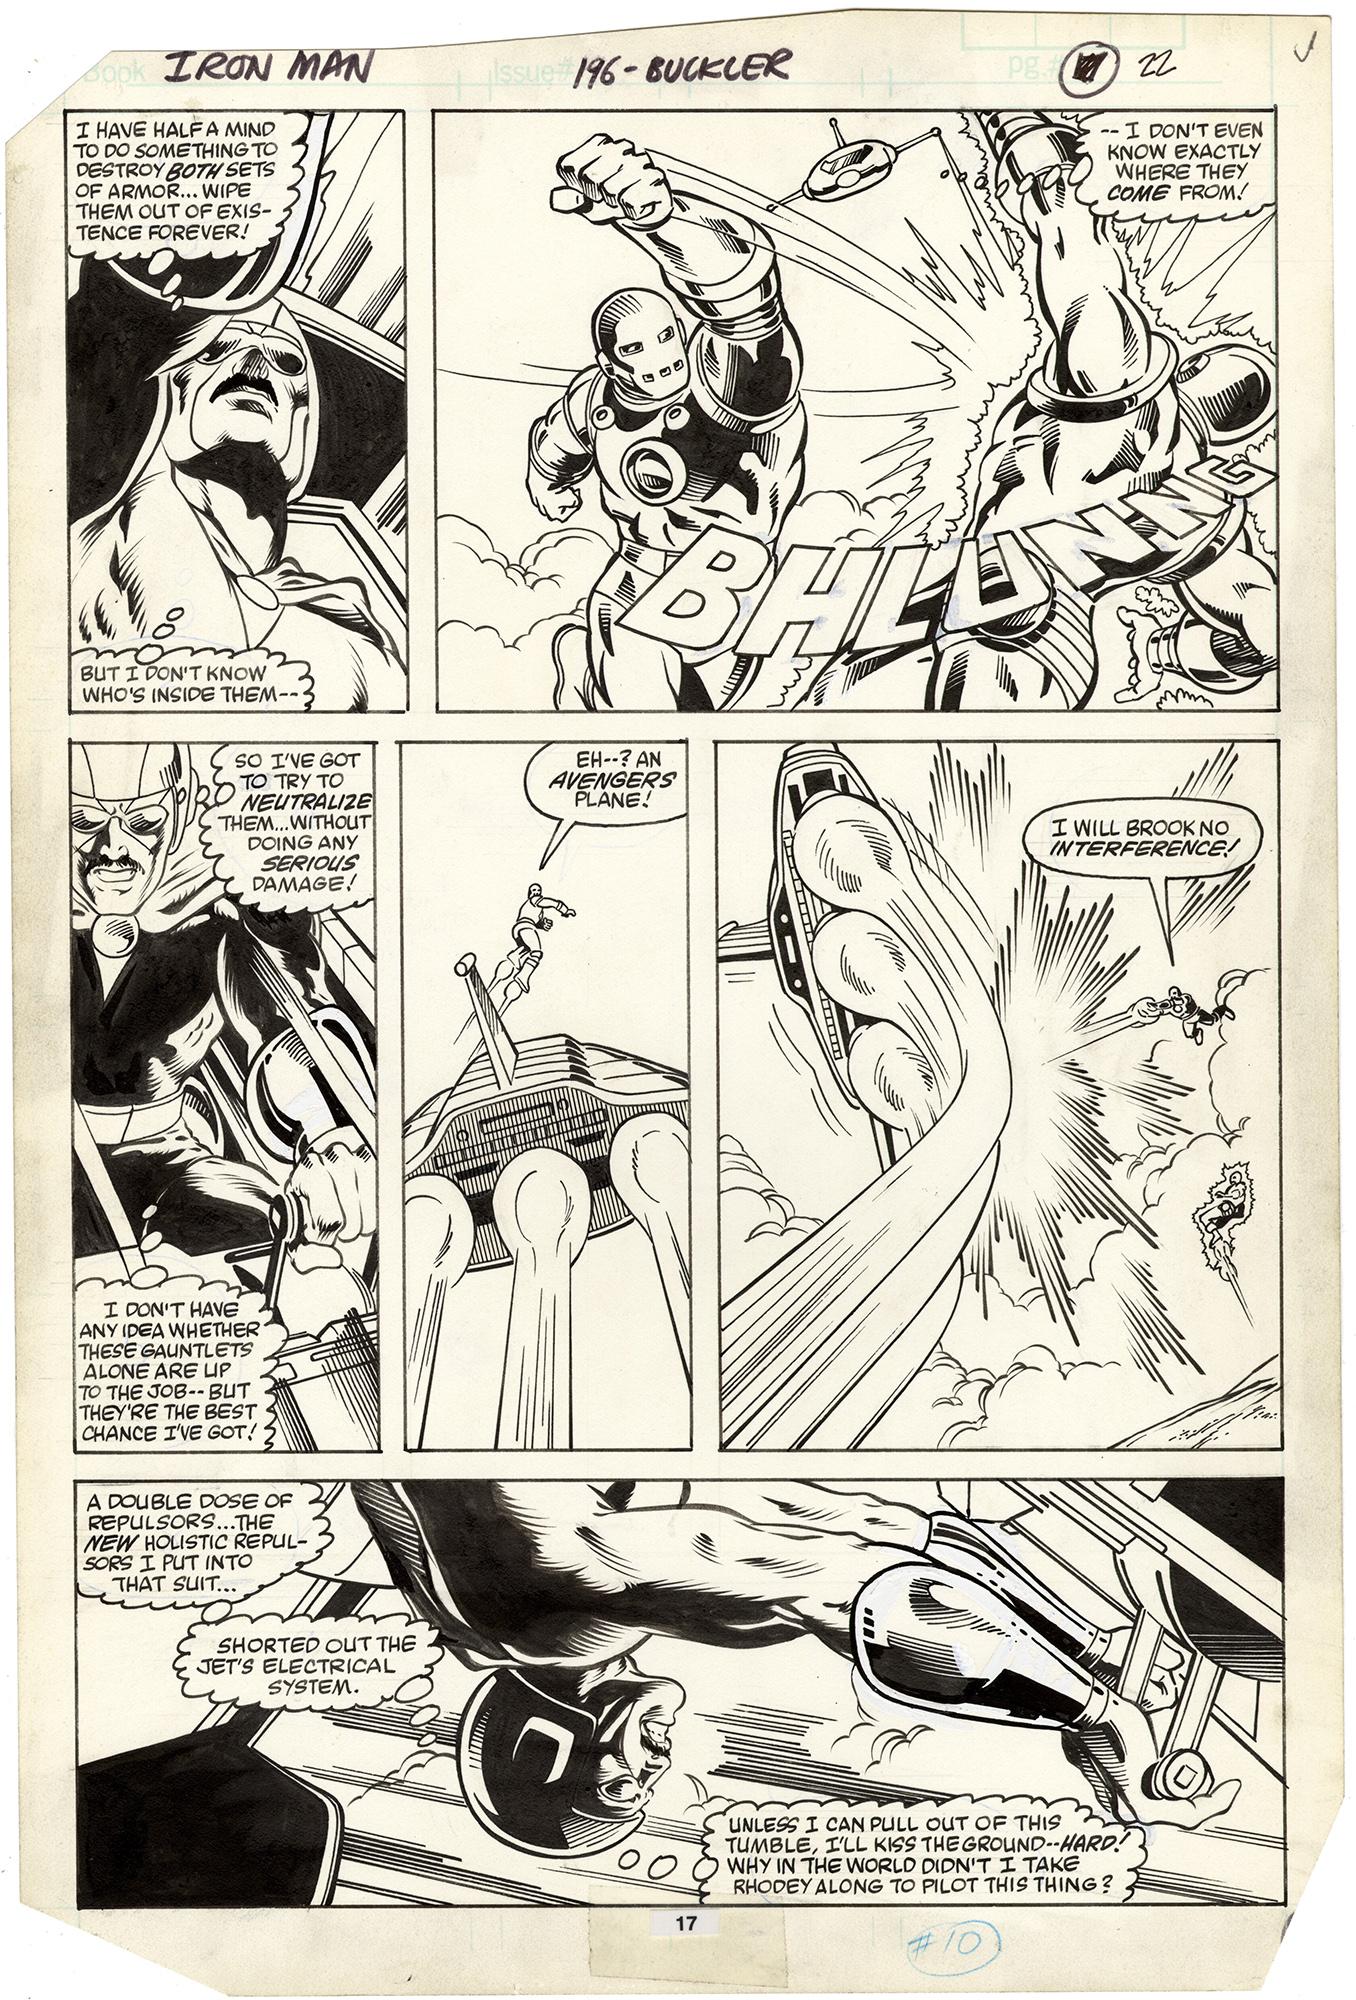 Iron Man #196 p17